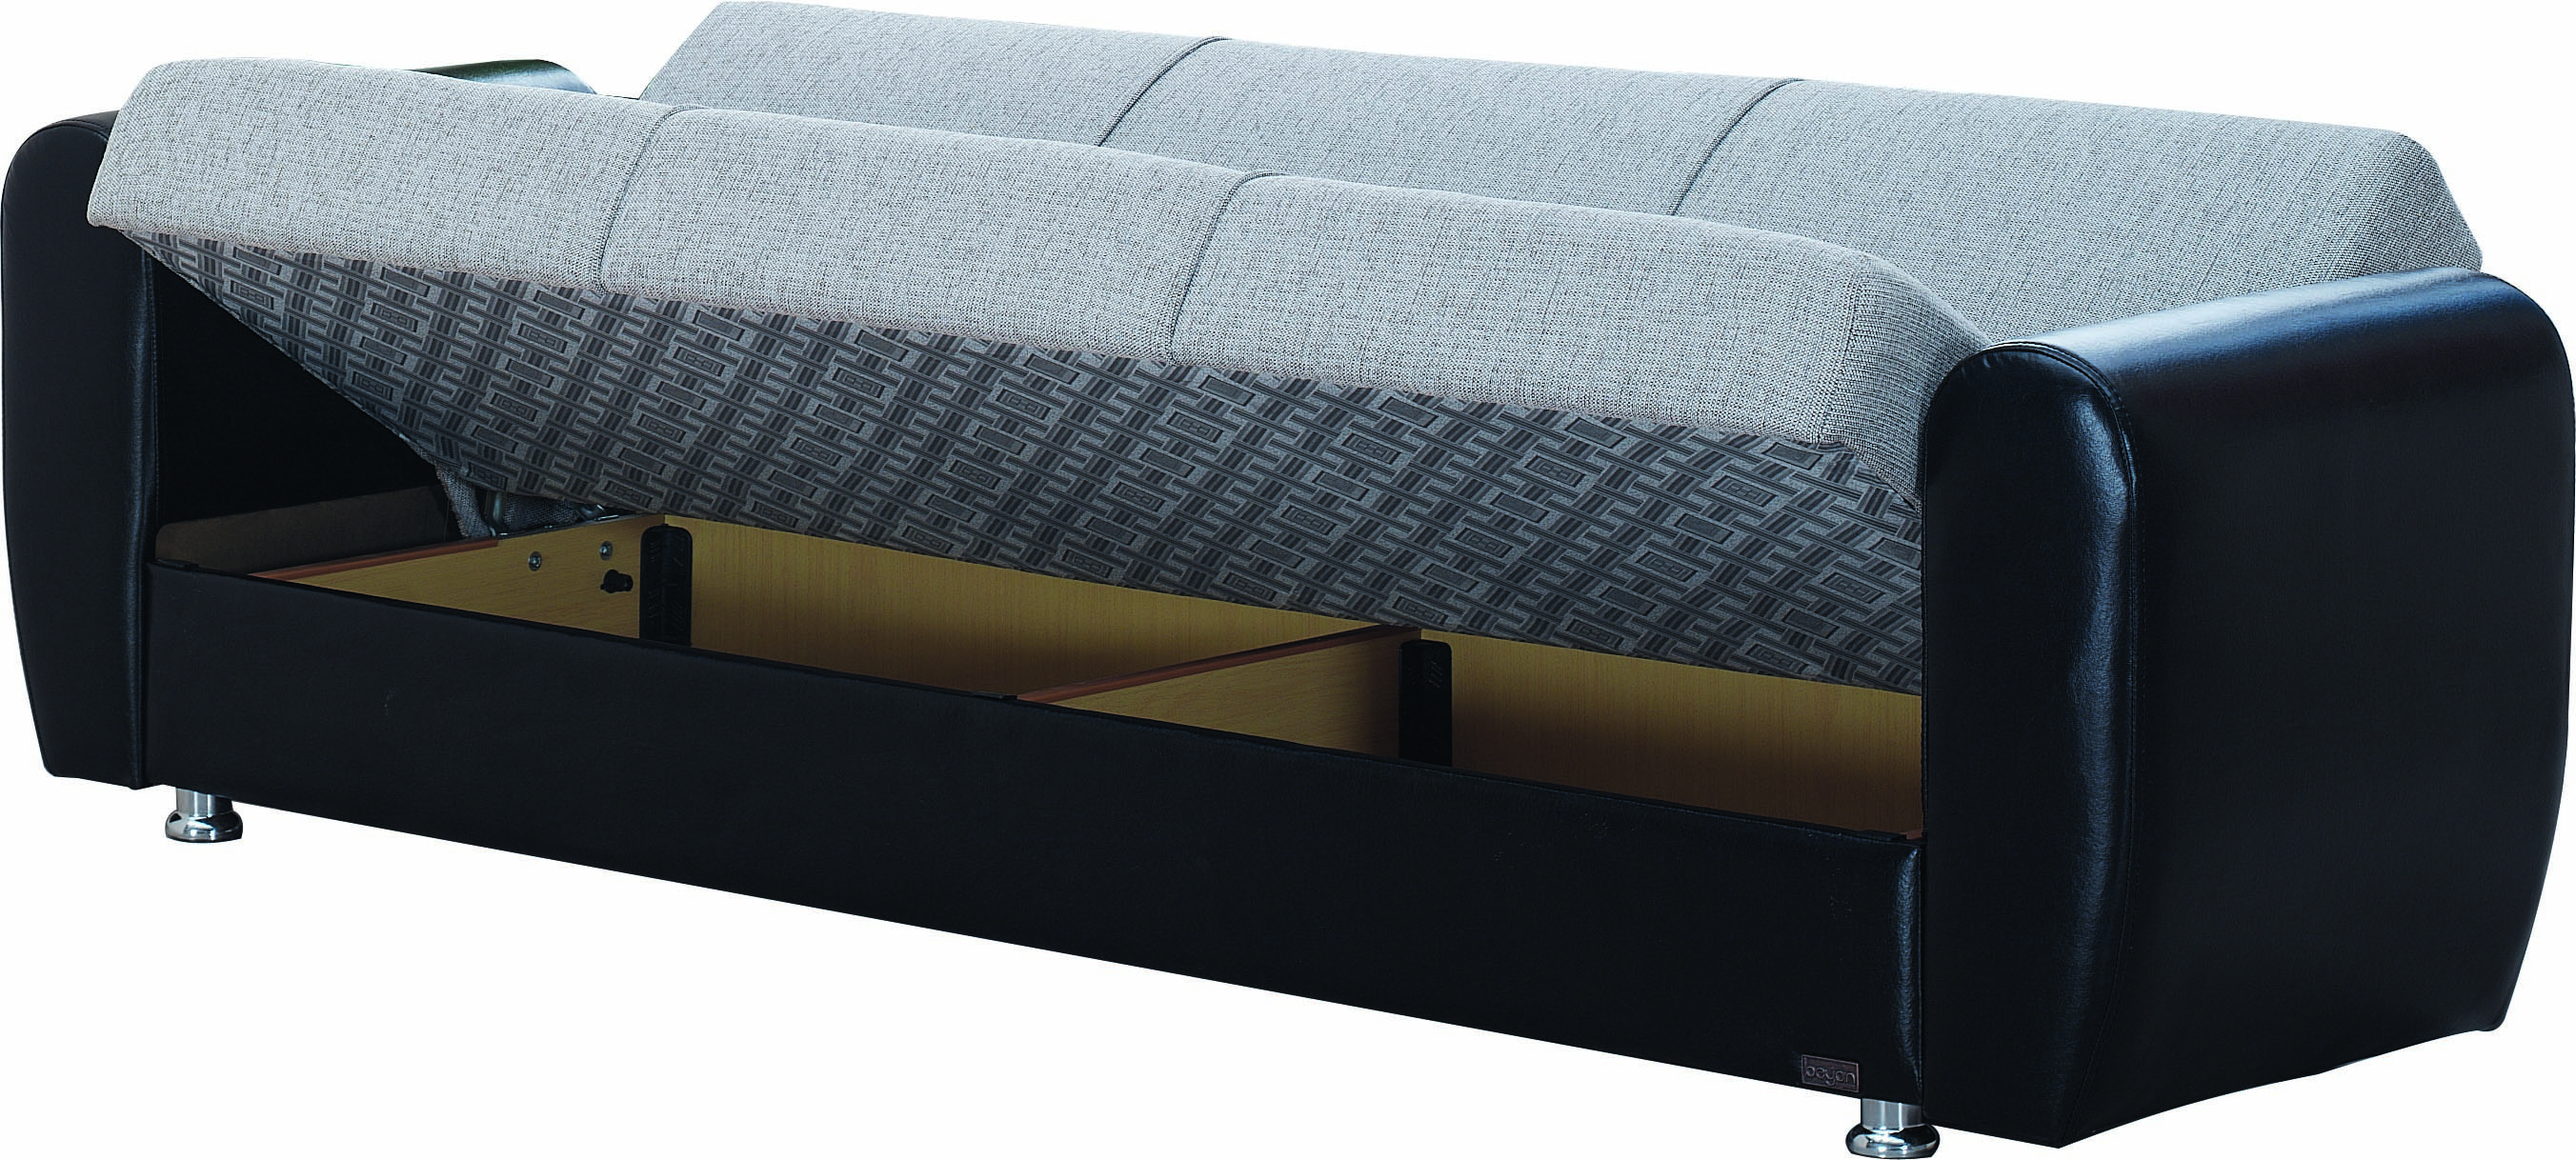 Houston sofa bed houston sofa bed by empire furniture usa for Sectional sleeper sofa houston